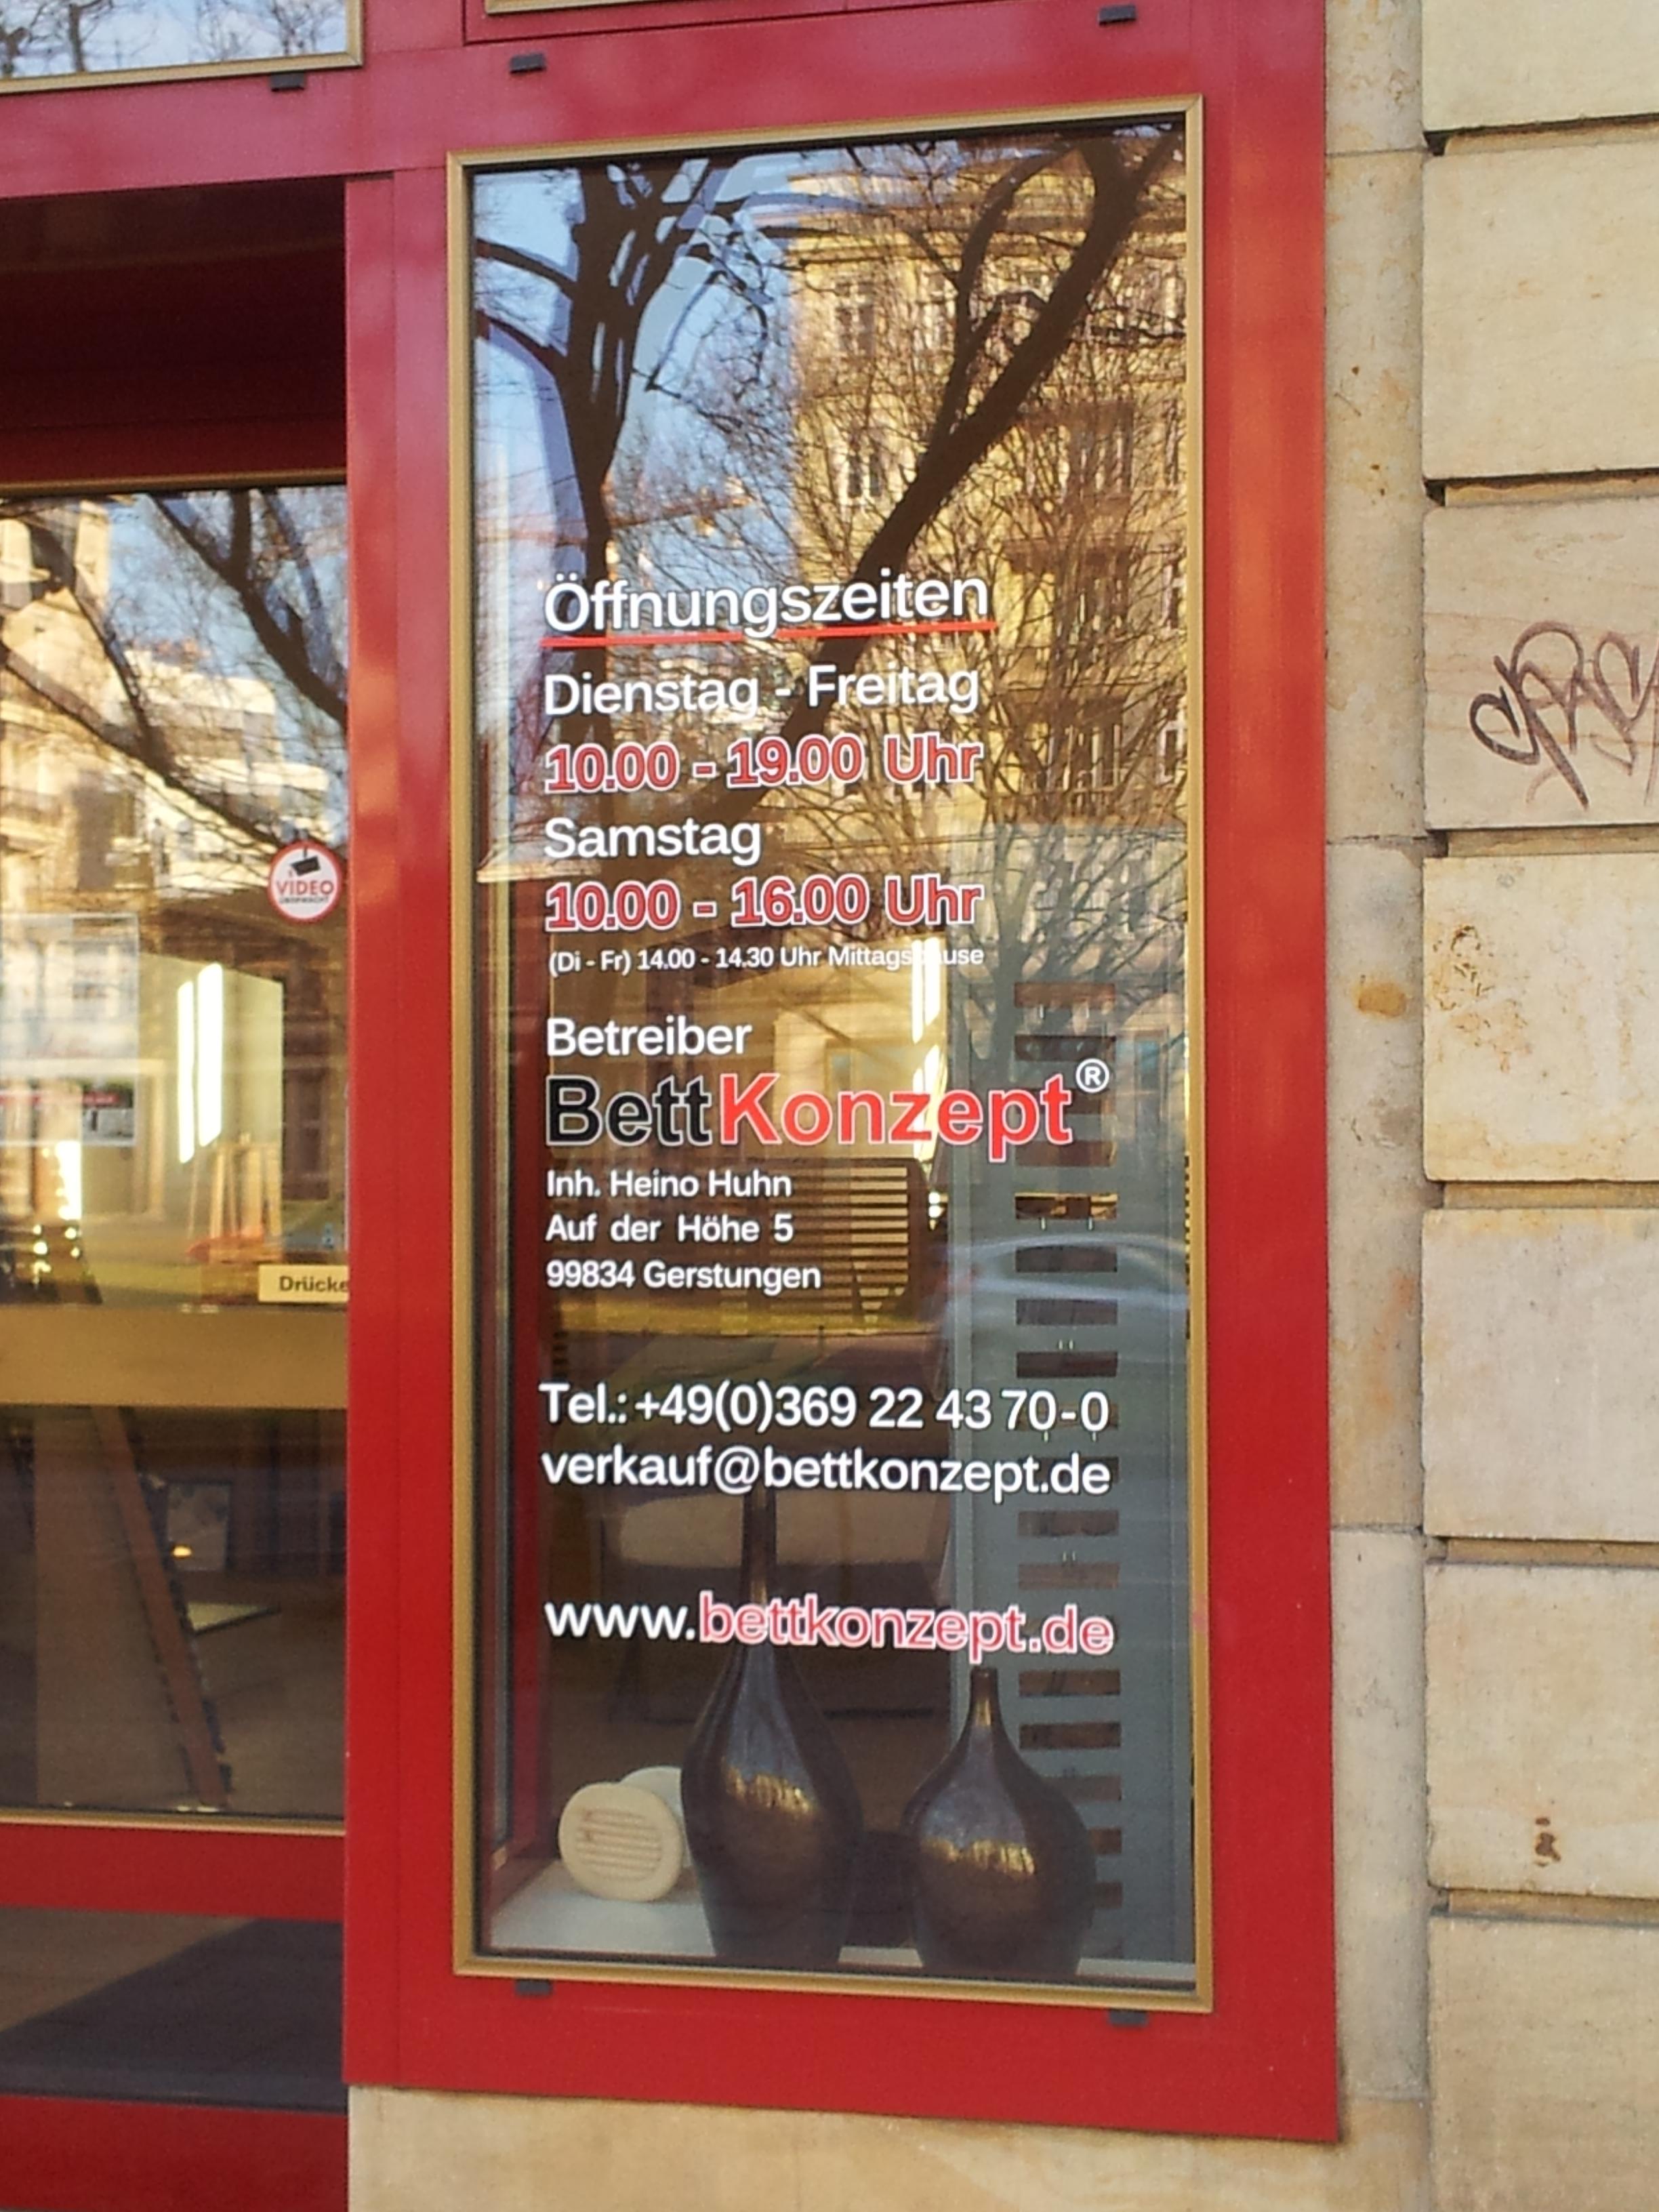 77c8271079abf4 ➤ Bettkonzept Store Berlin 10247 Berlin-Friedrichshain ...